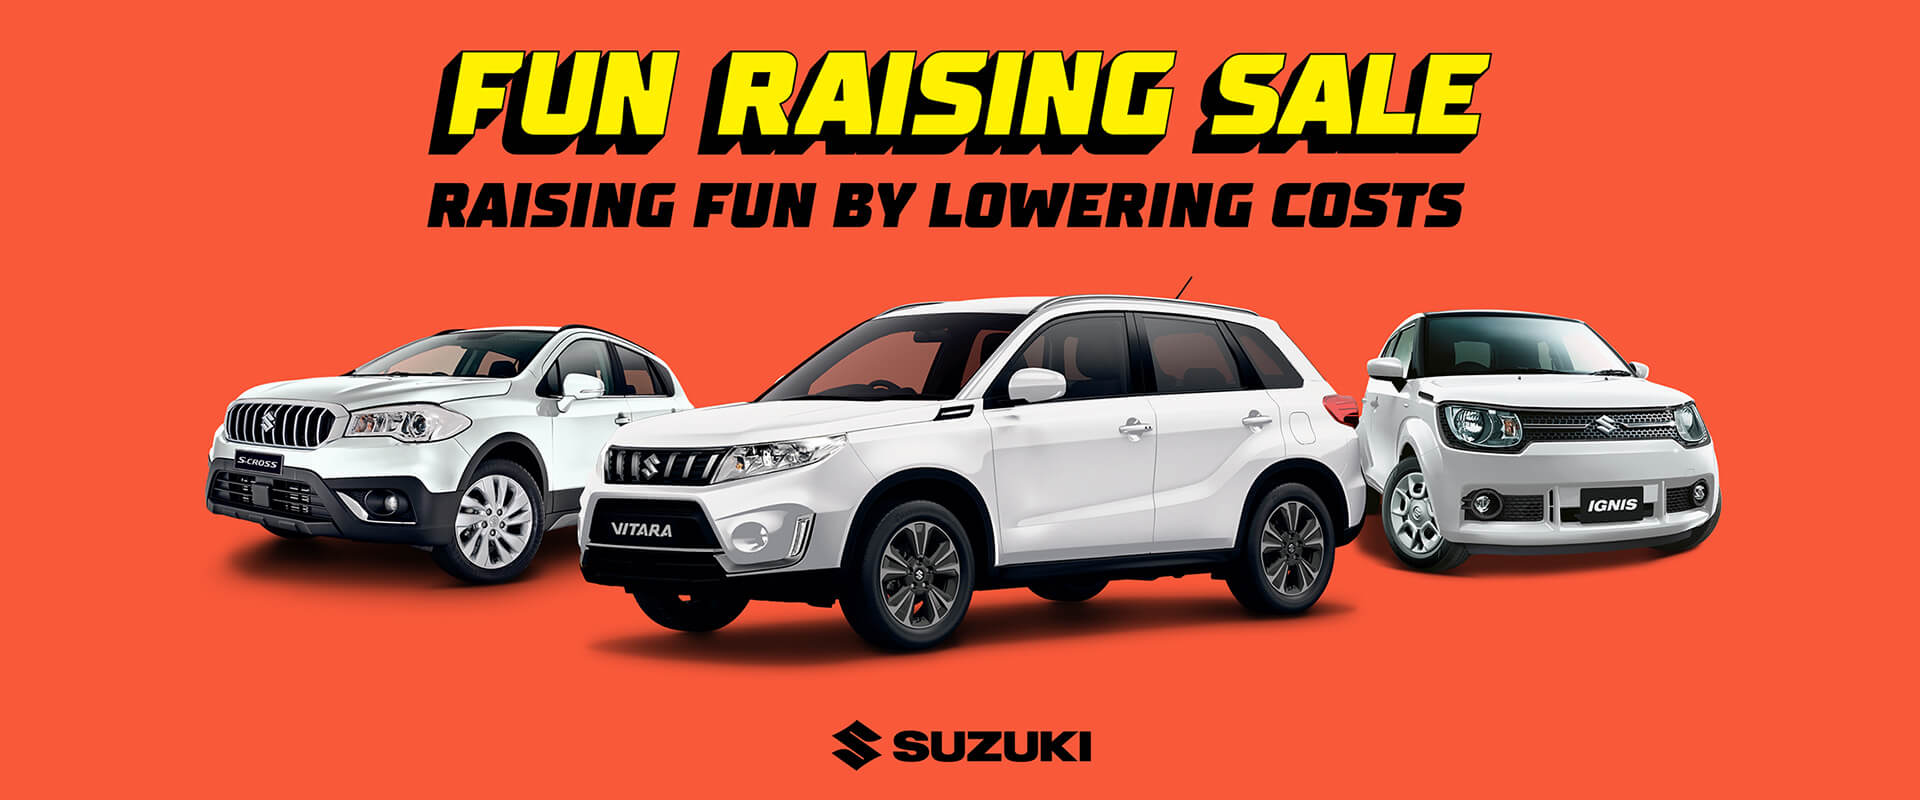 Fun Raising Sale